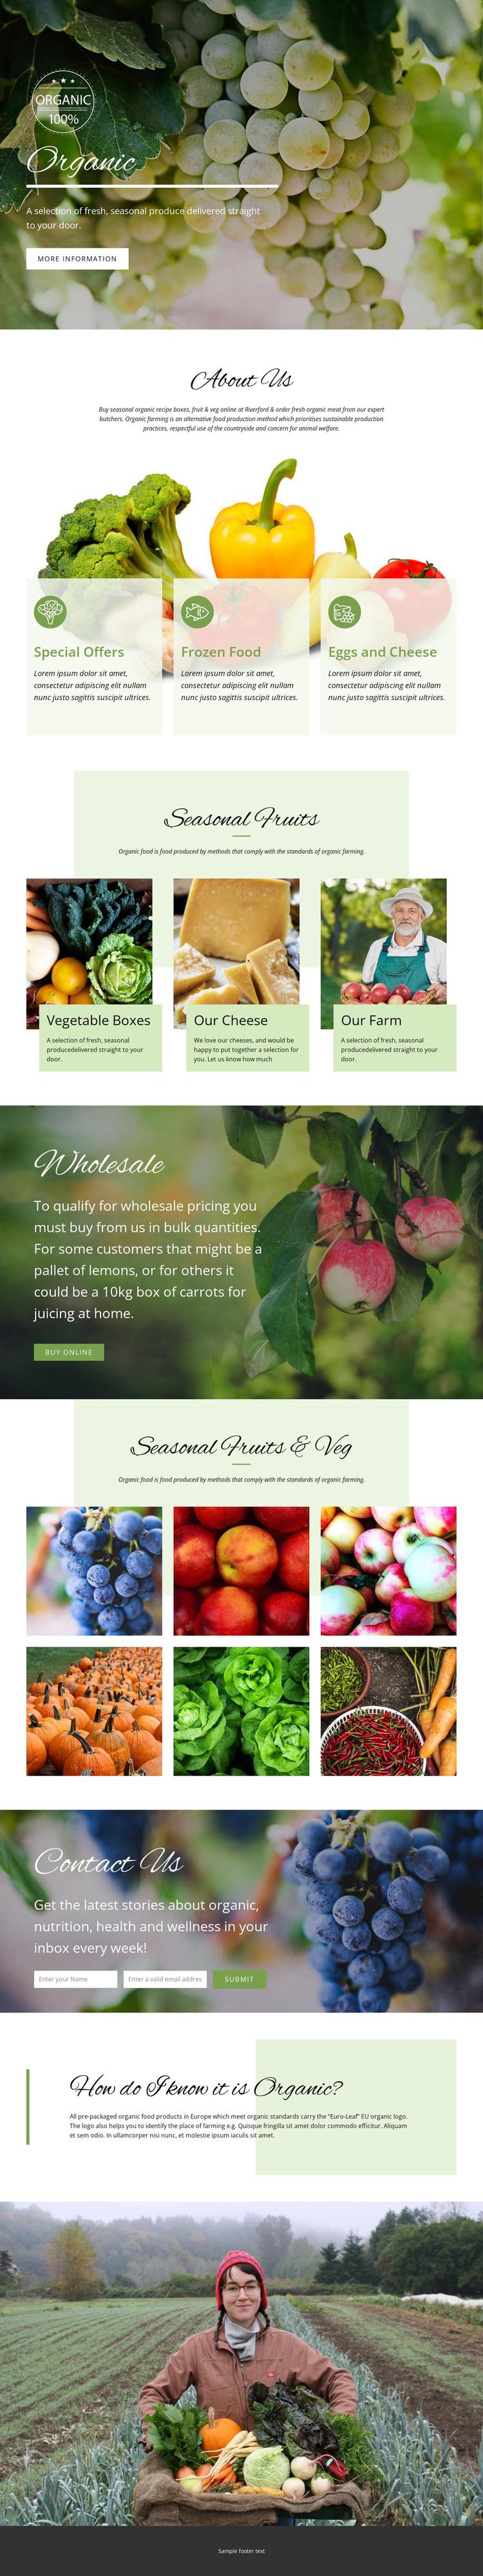 Healthier with organic food Web Design